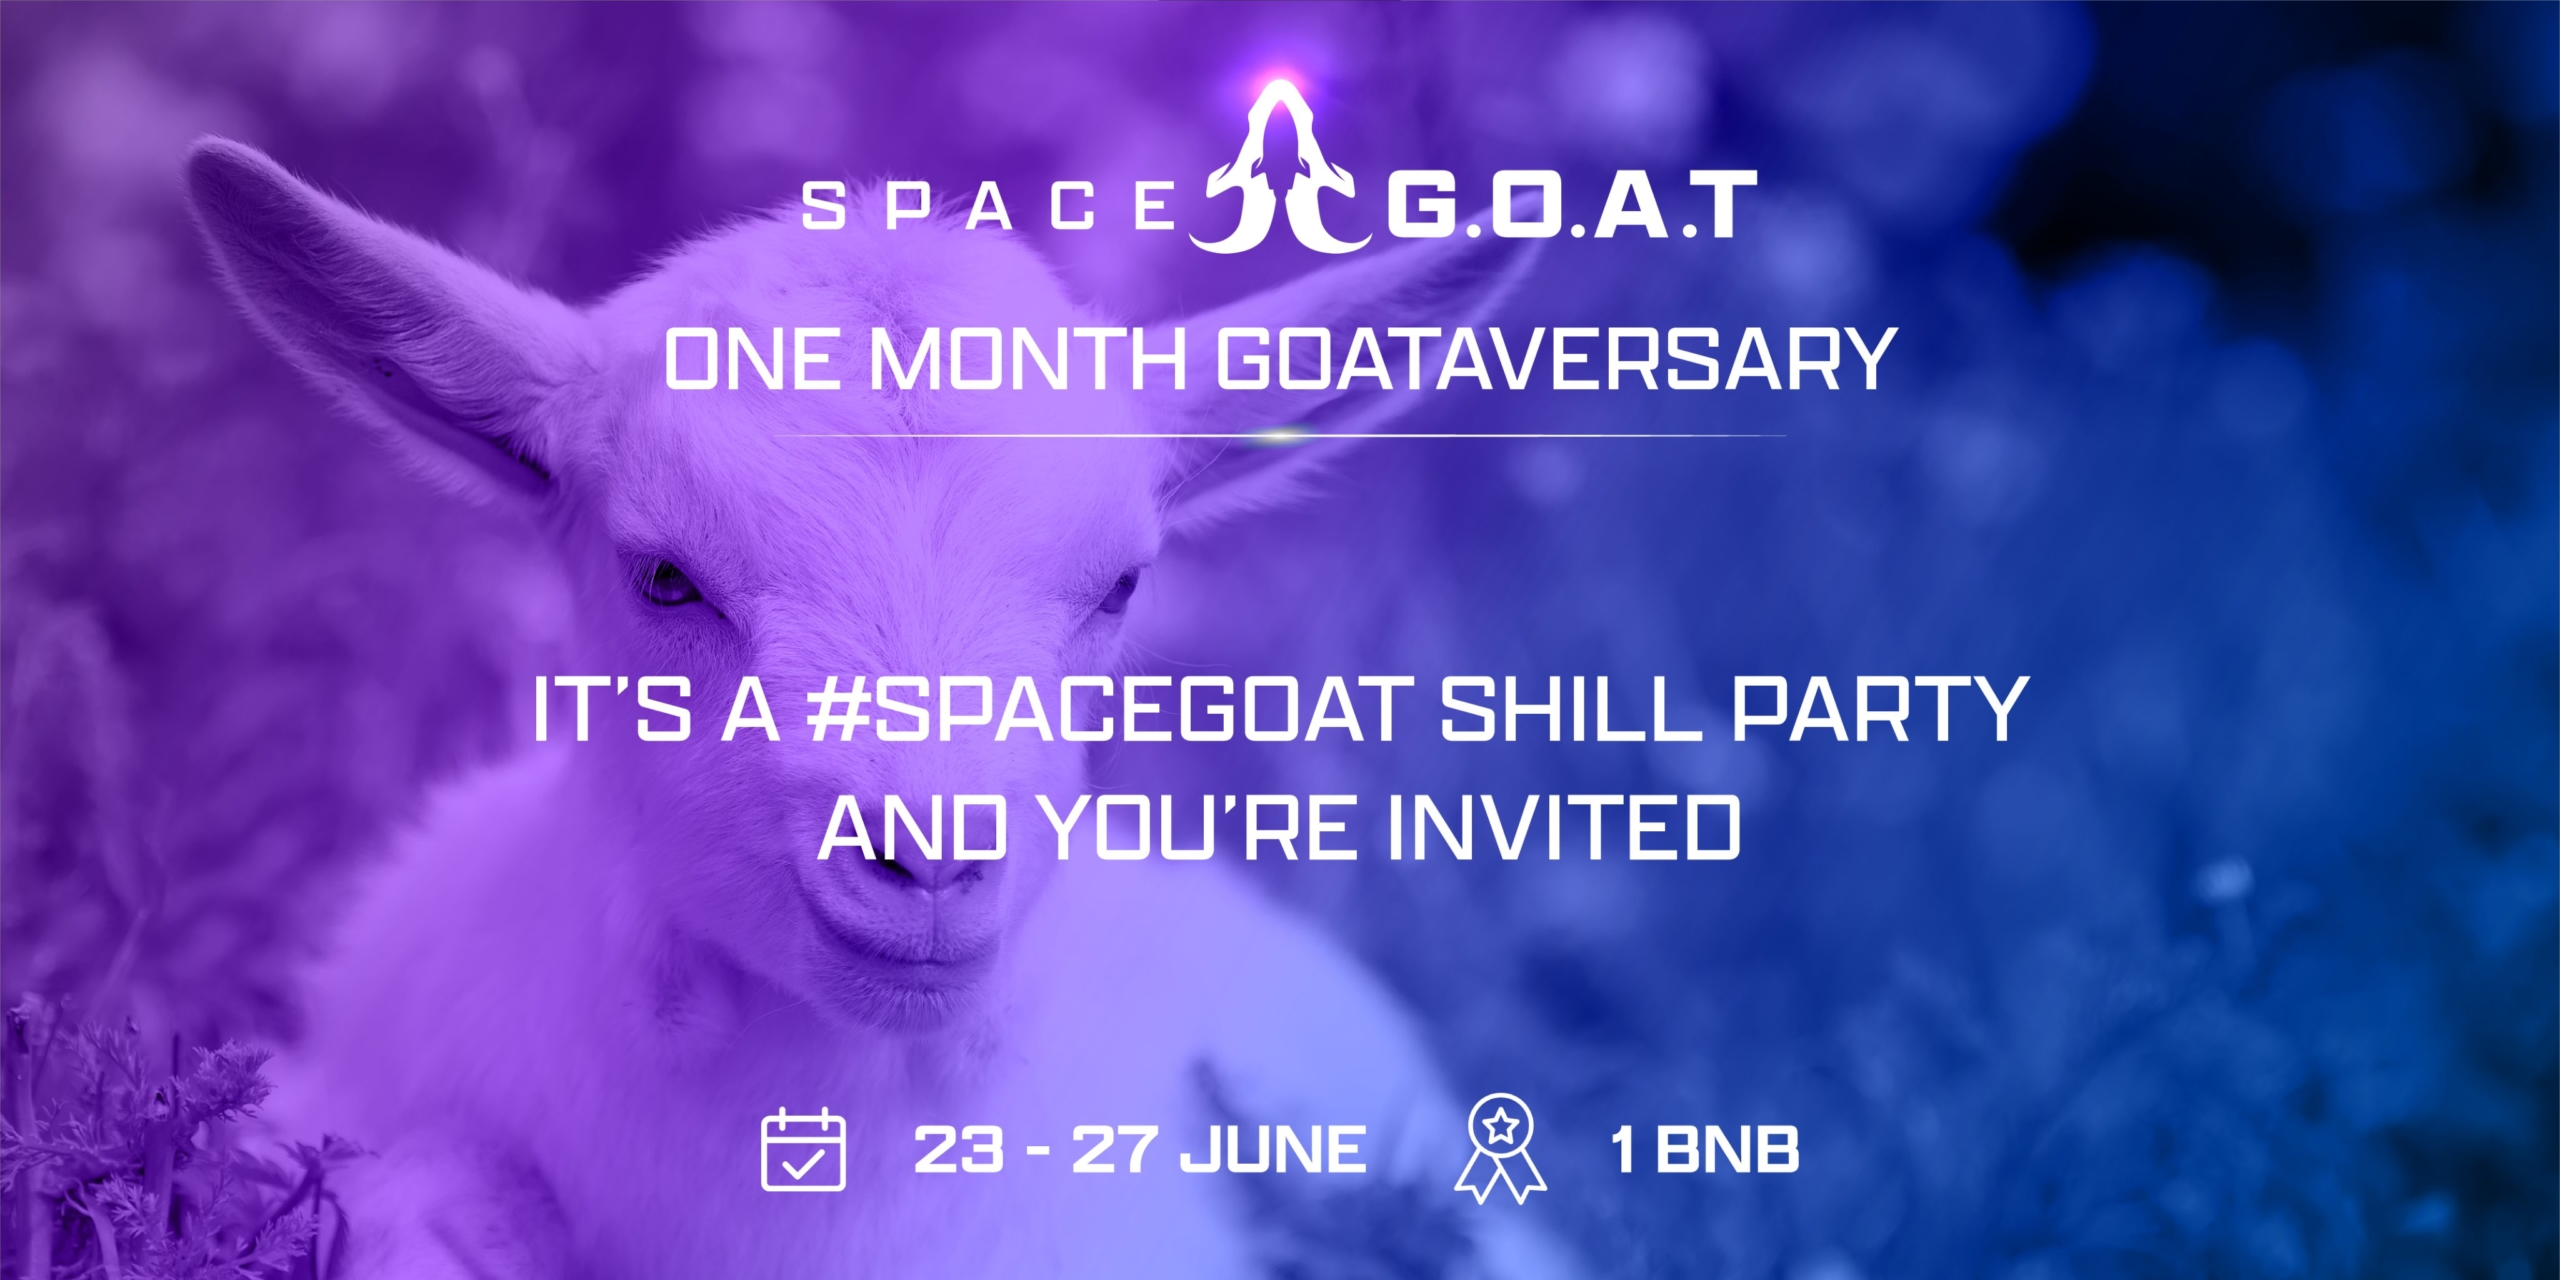 SpaceGoat 1 Month Goataversary